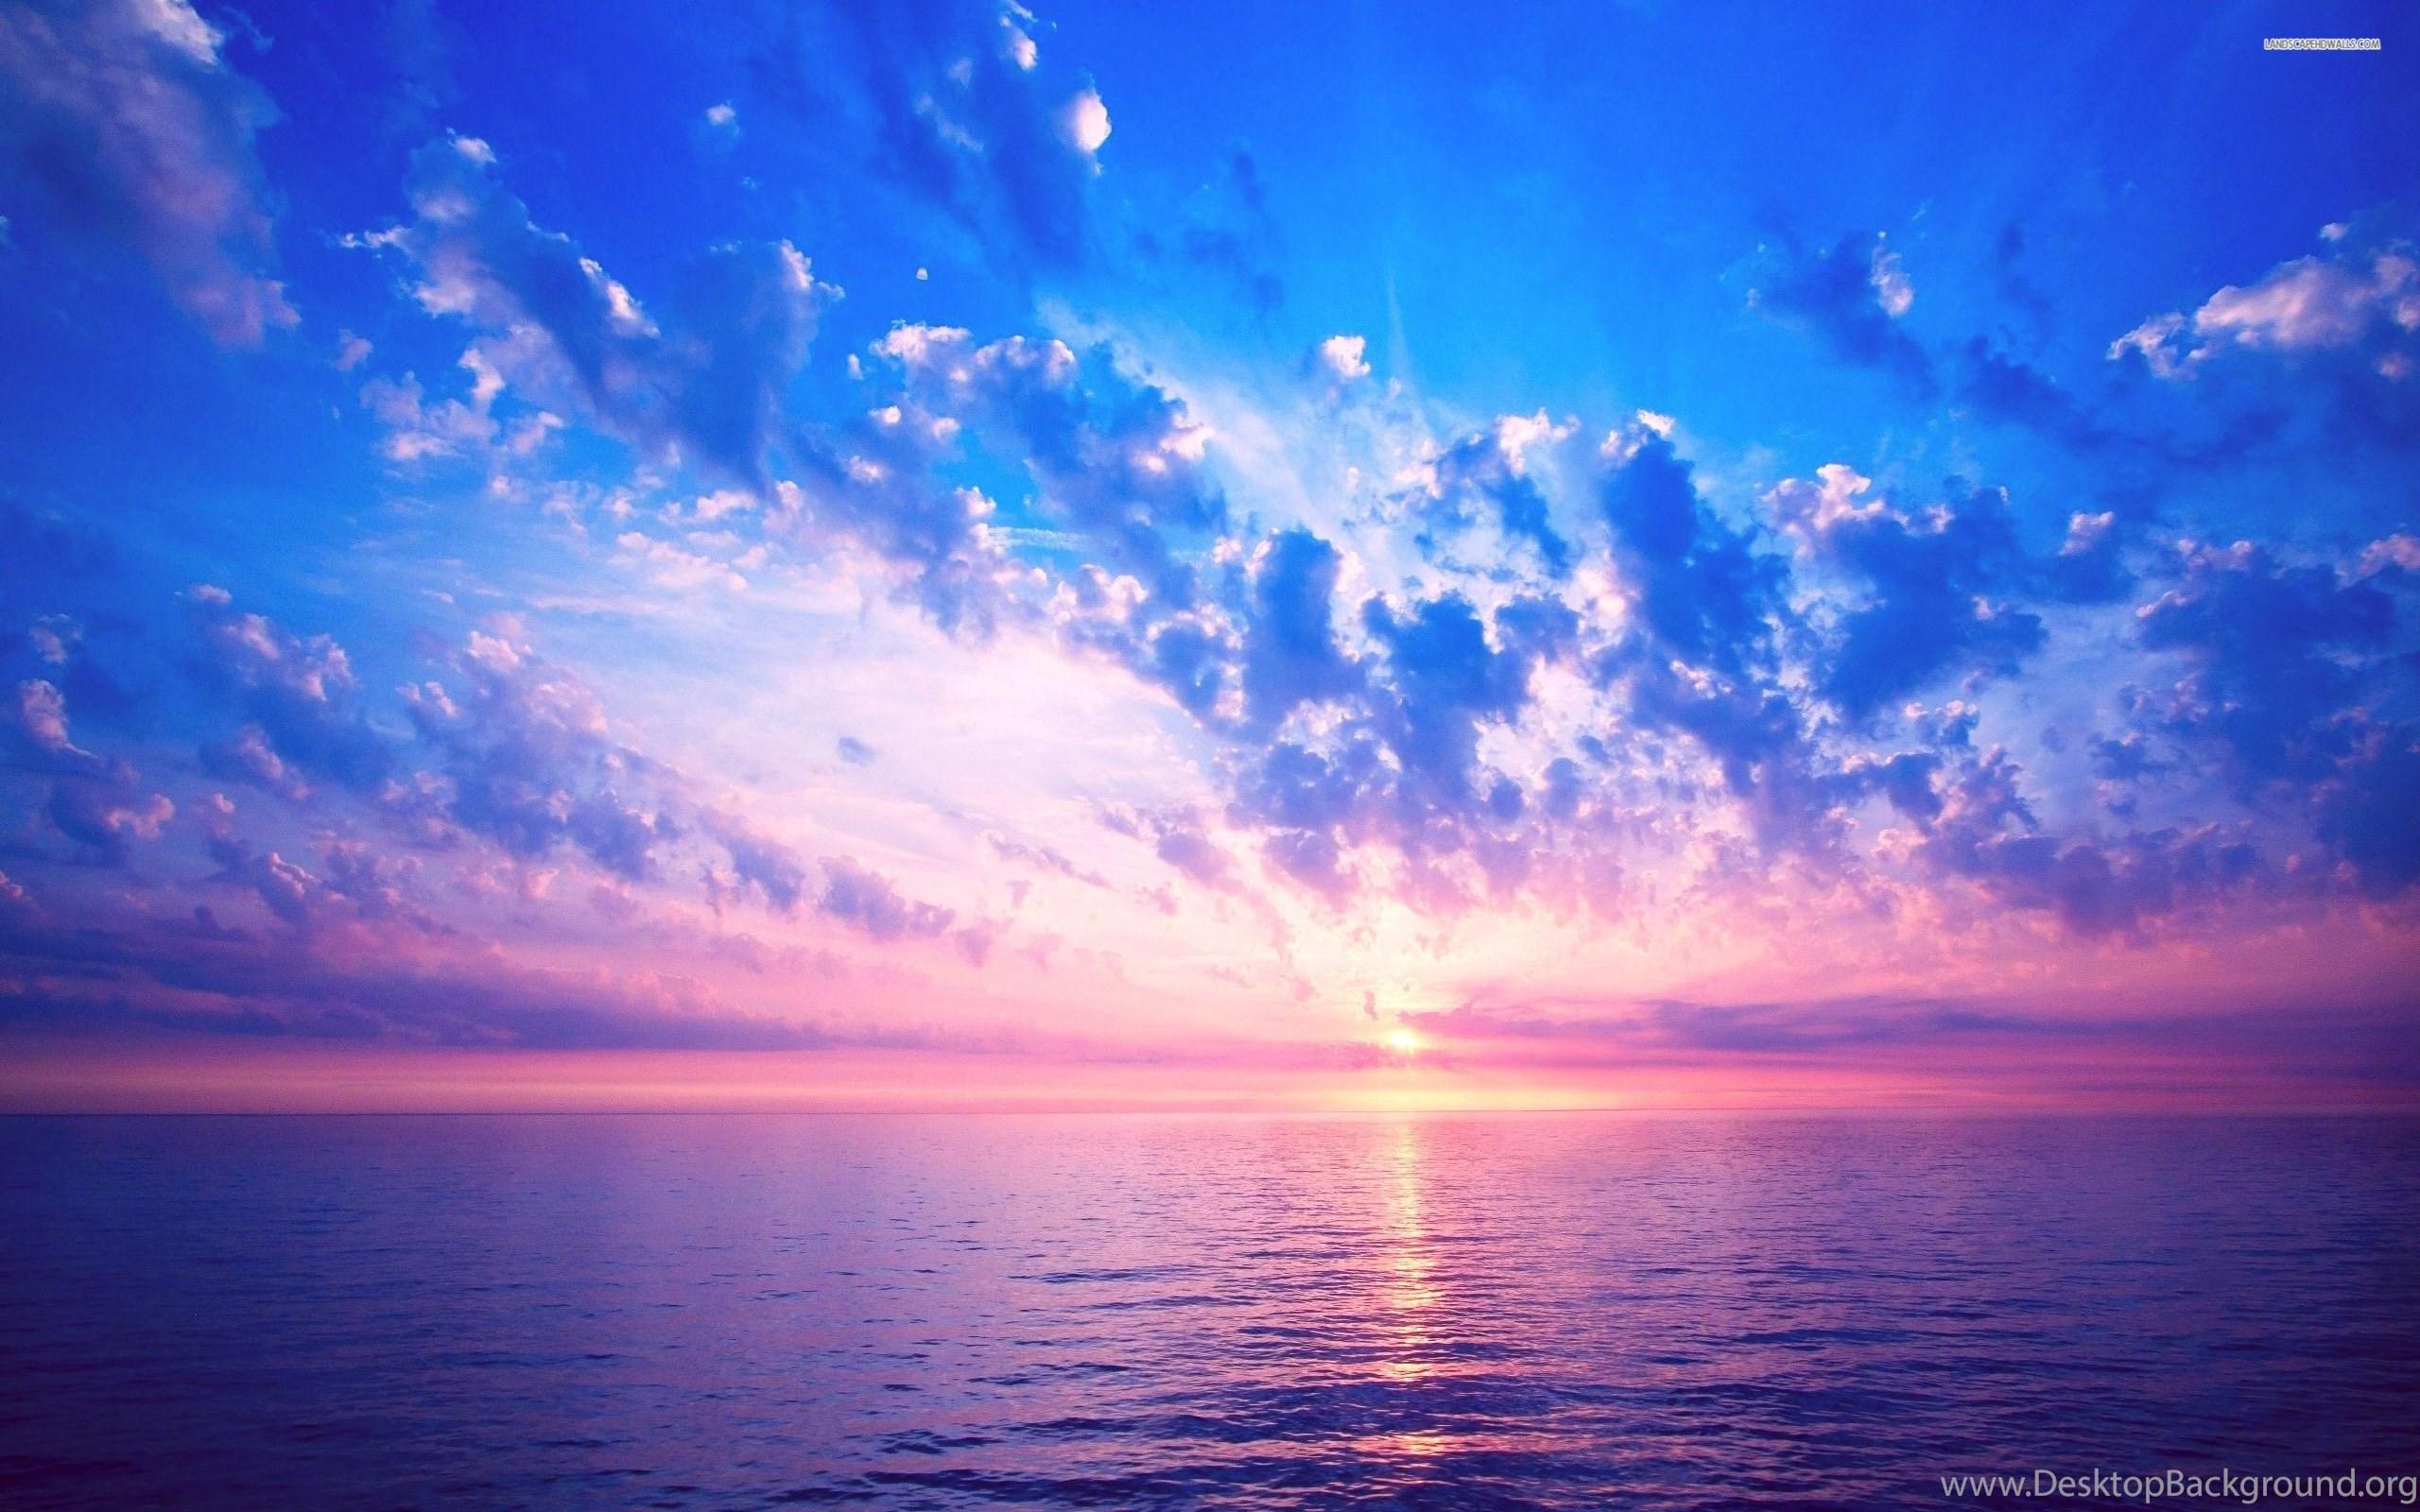 beautiful pink sky above the ocean, cloud, beaches, 2560x1600 hd